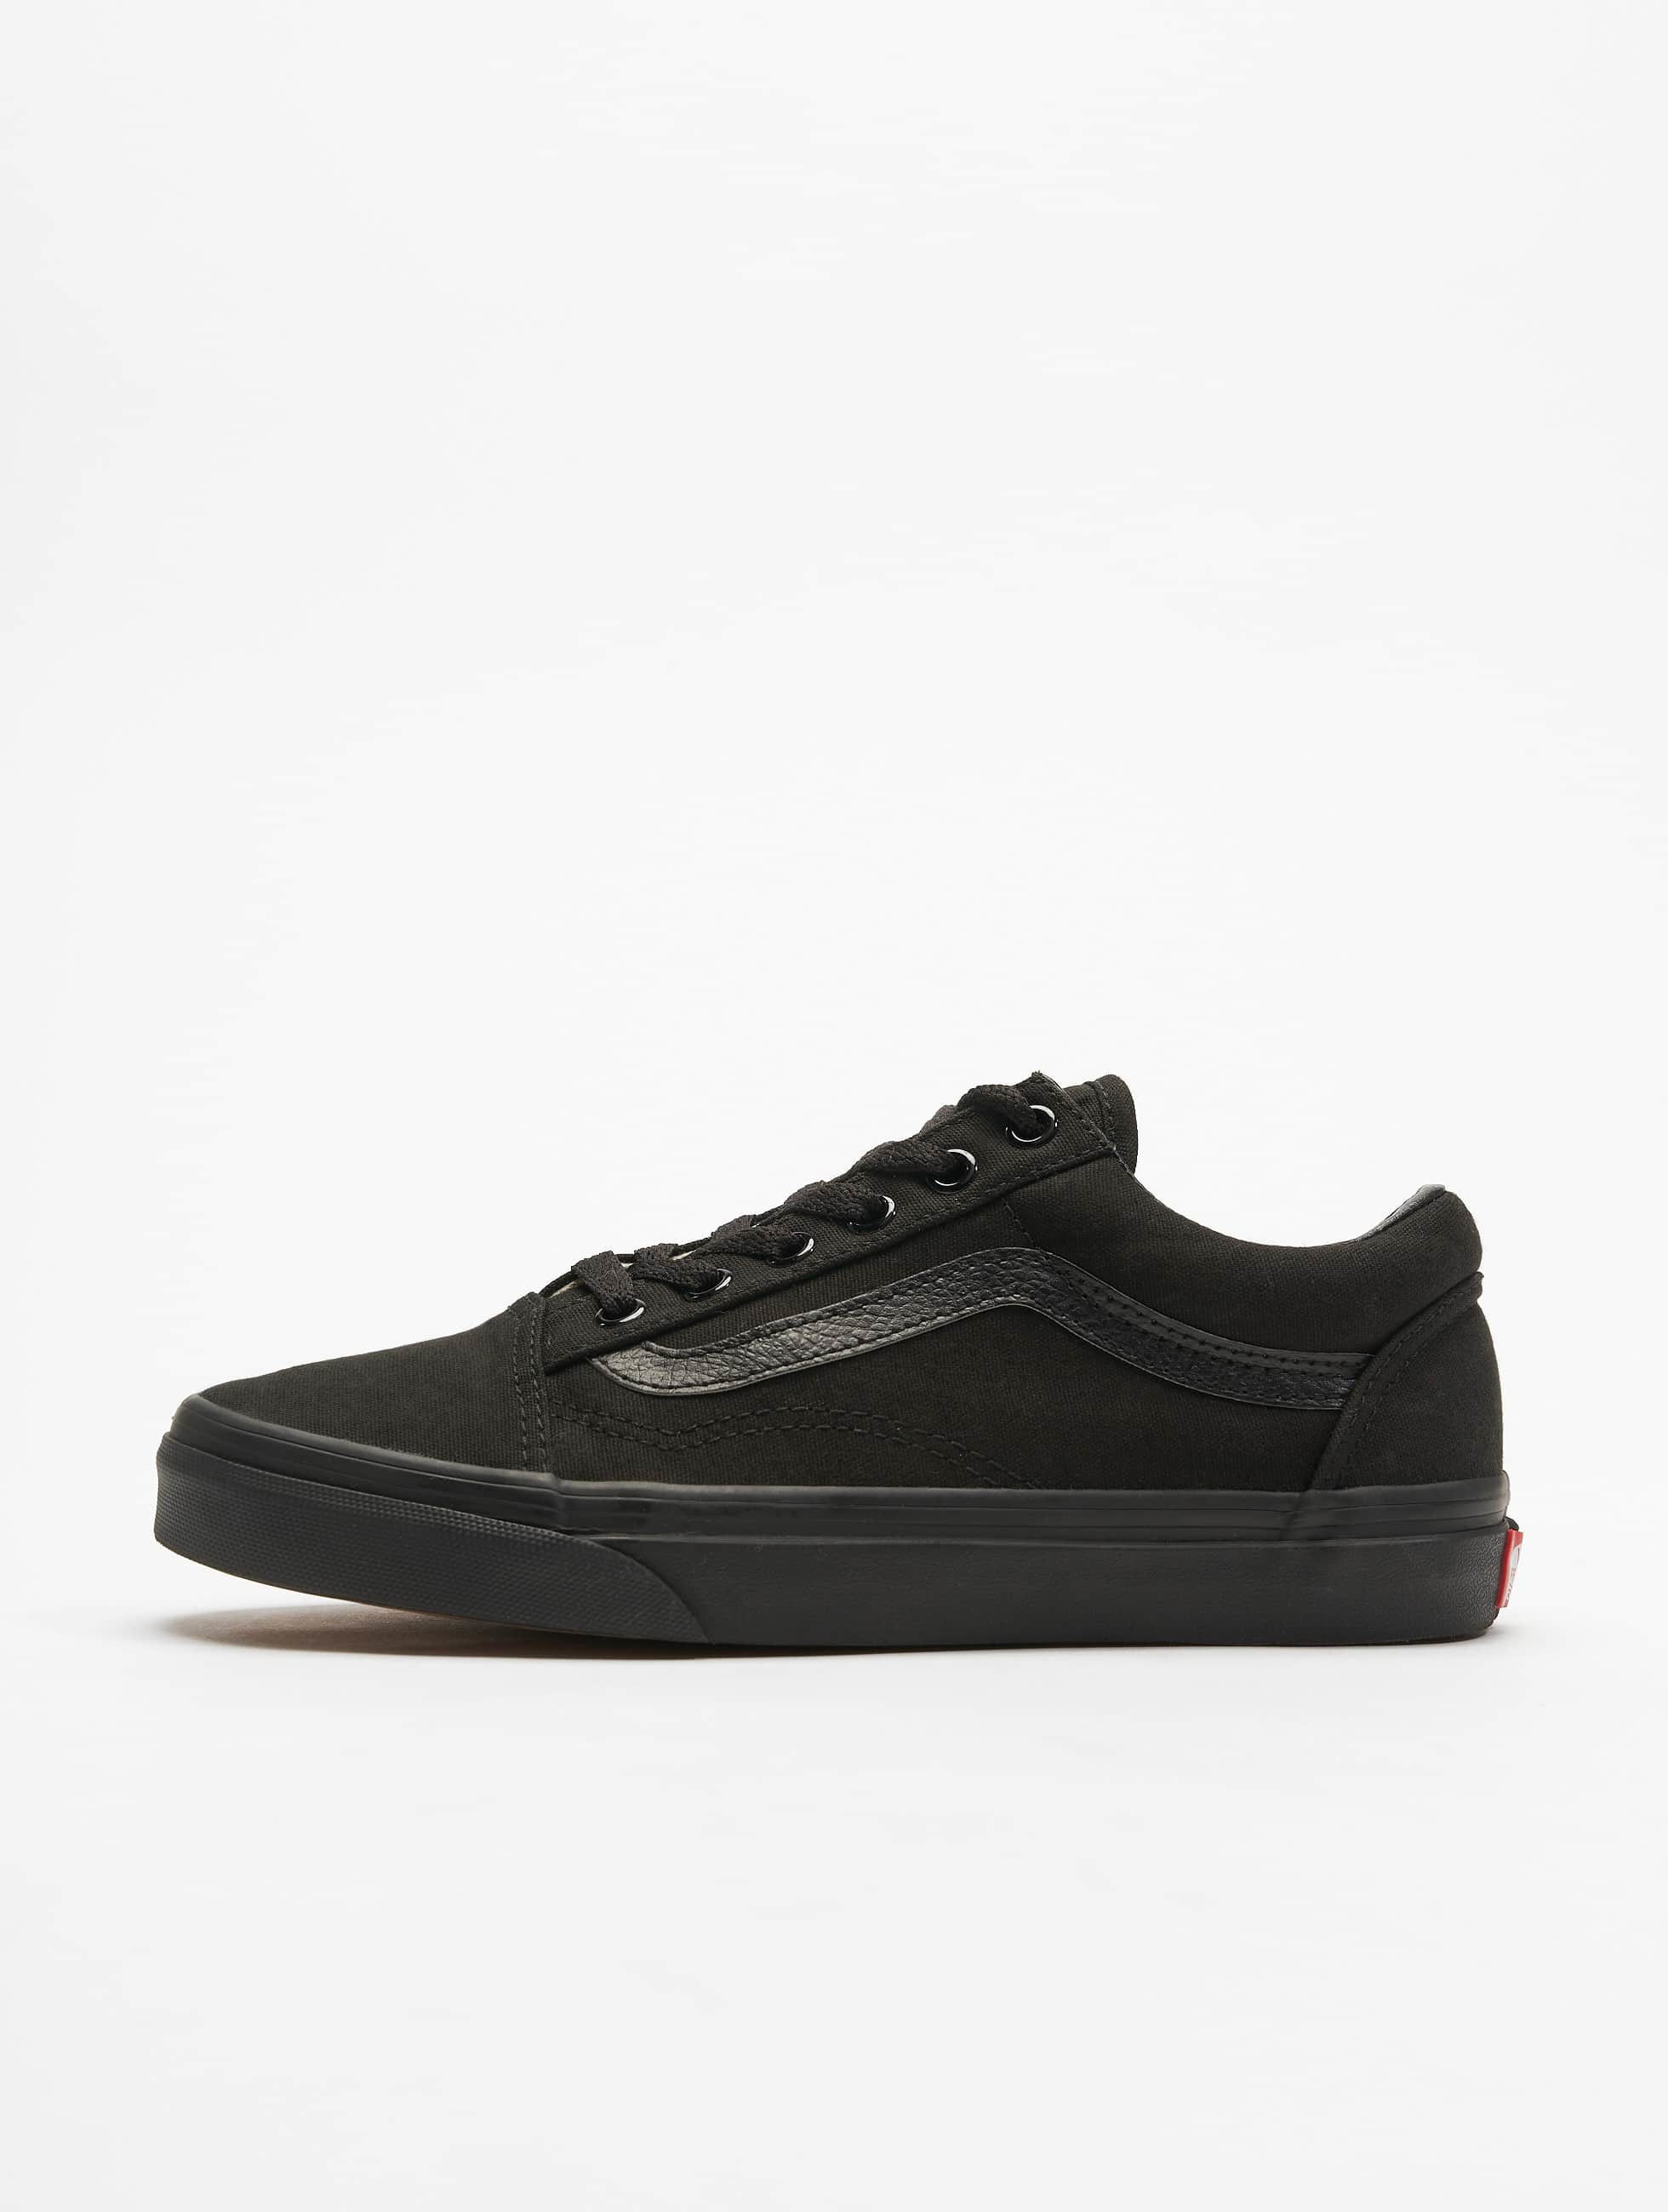 vans old skool noir baskets vans acheter pas cher chaussures 213086. Black Bedroom Furniture Sets. Home Design Ideas